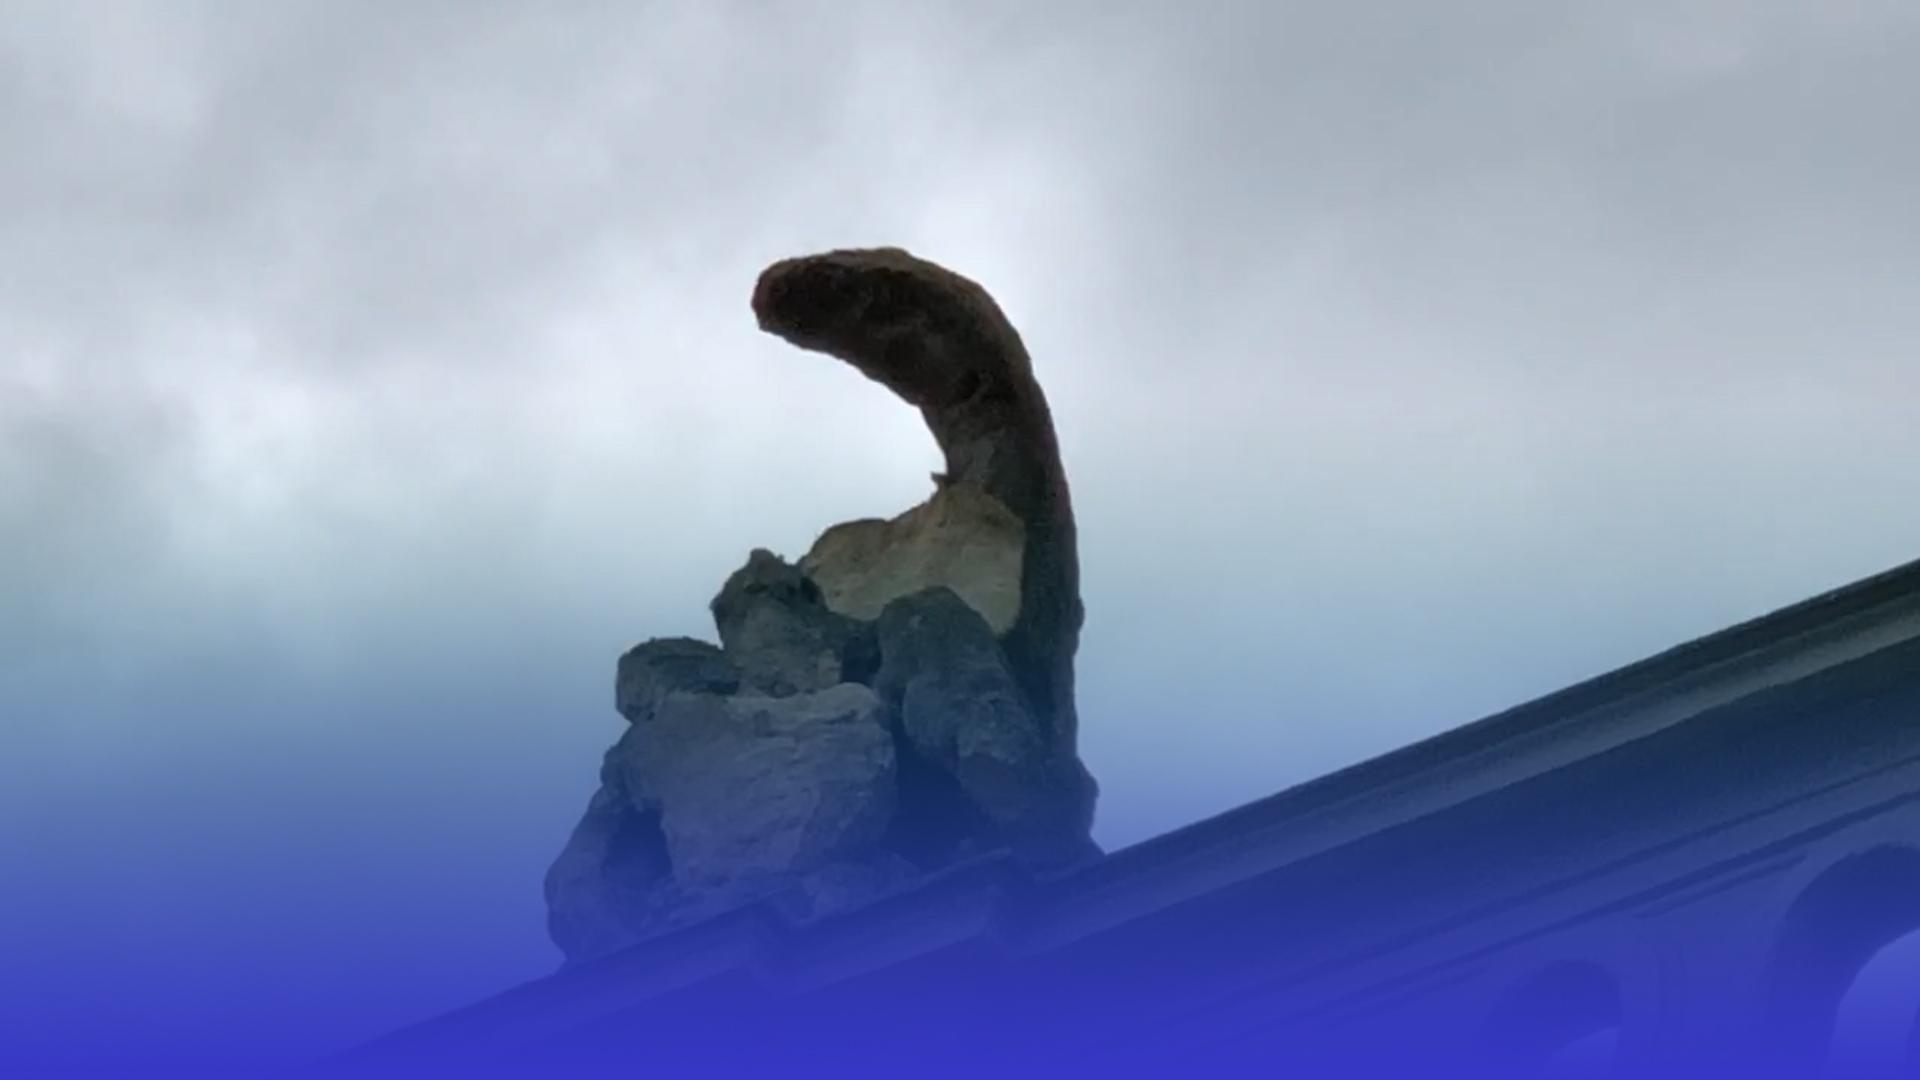 Пошкоджена остання скульптура Пінзеля: трісла 14-та статуя на Бучацькій ратуші